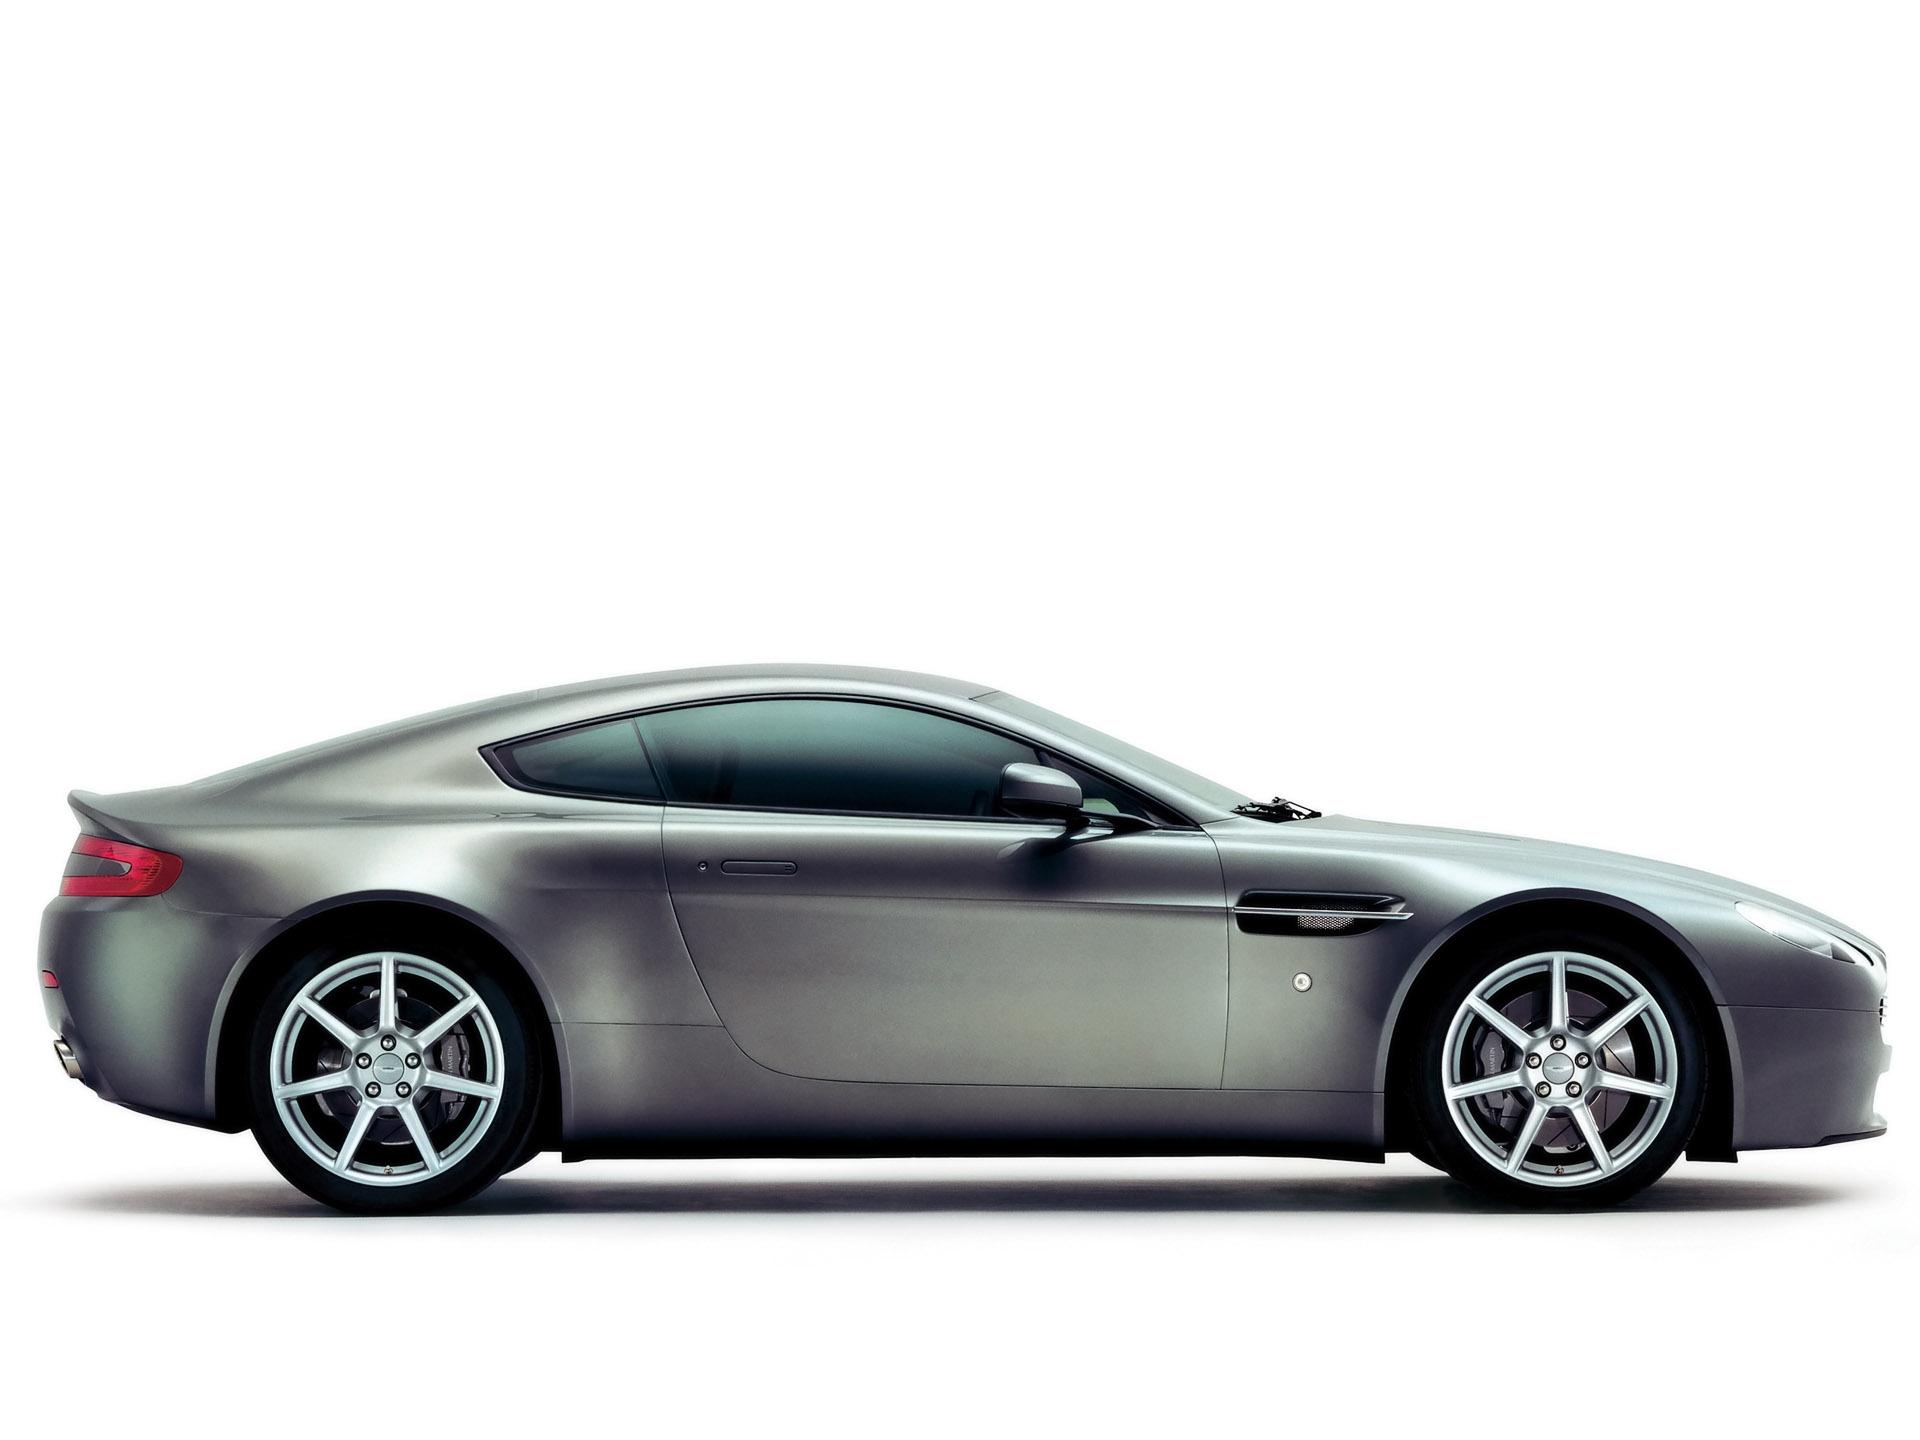 Aston Martin V Vantage Image Photo Of - 2006 aston martin vantage